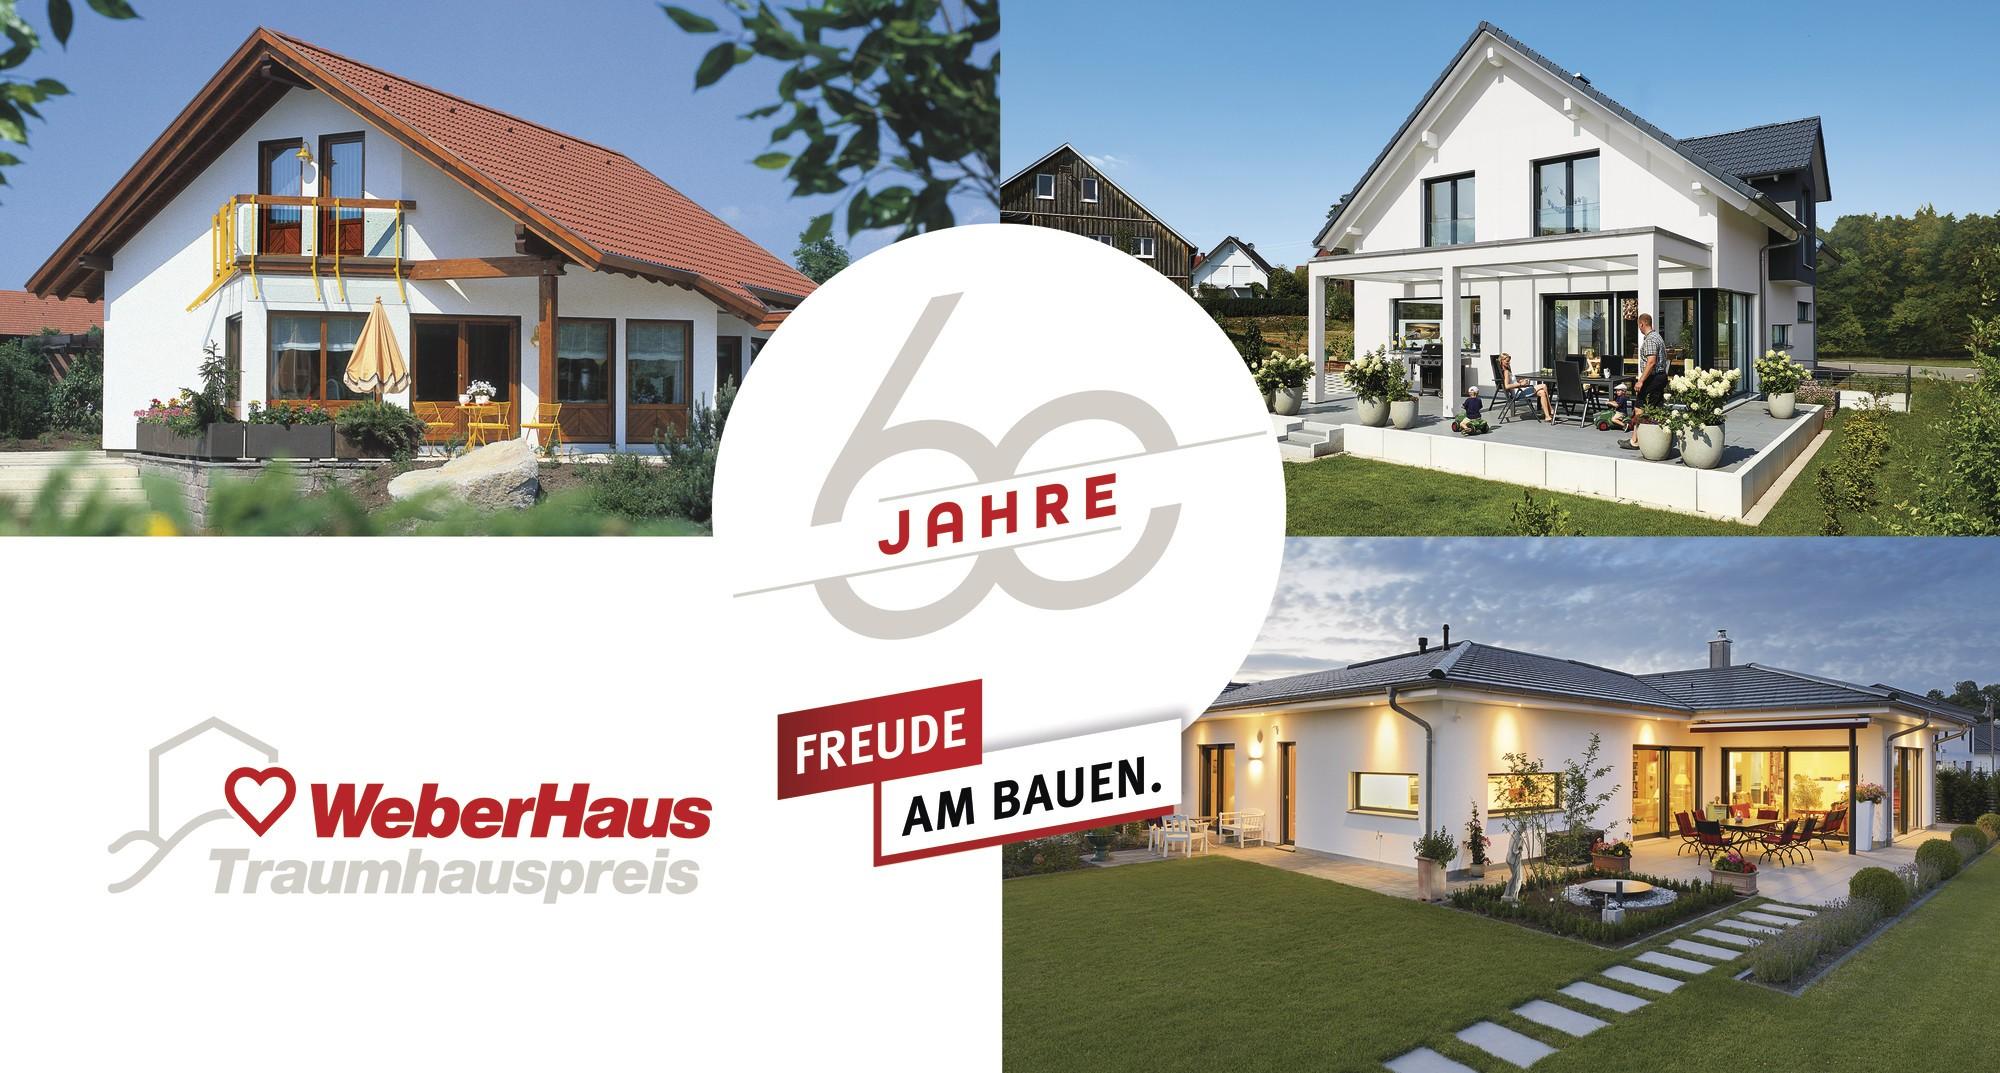 WeberHaus ruft Traumhauspreis aus